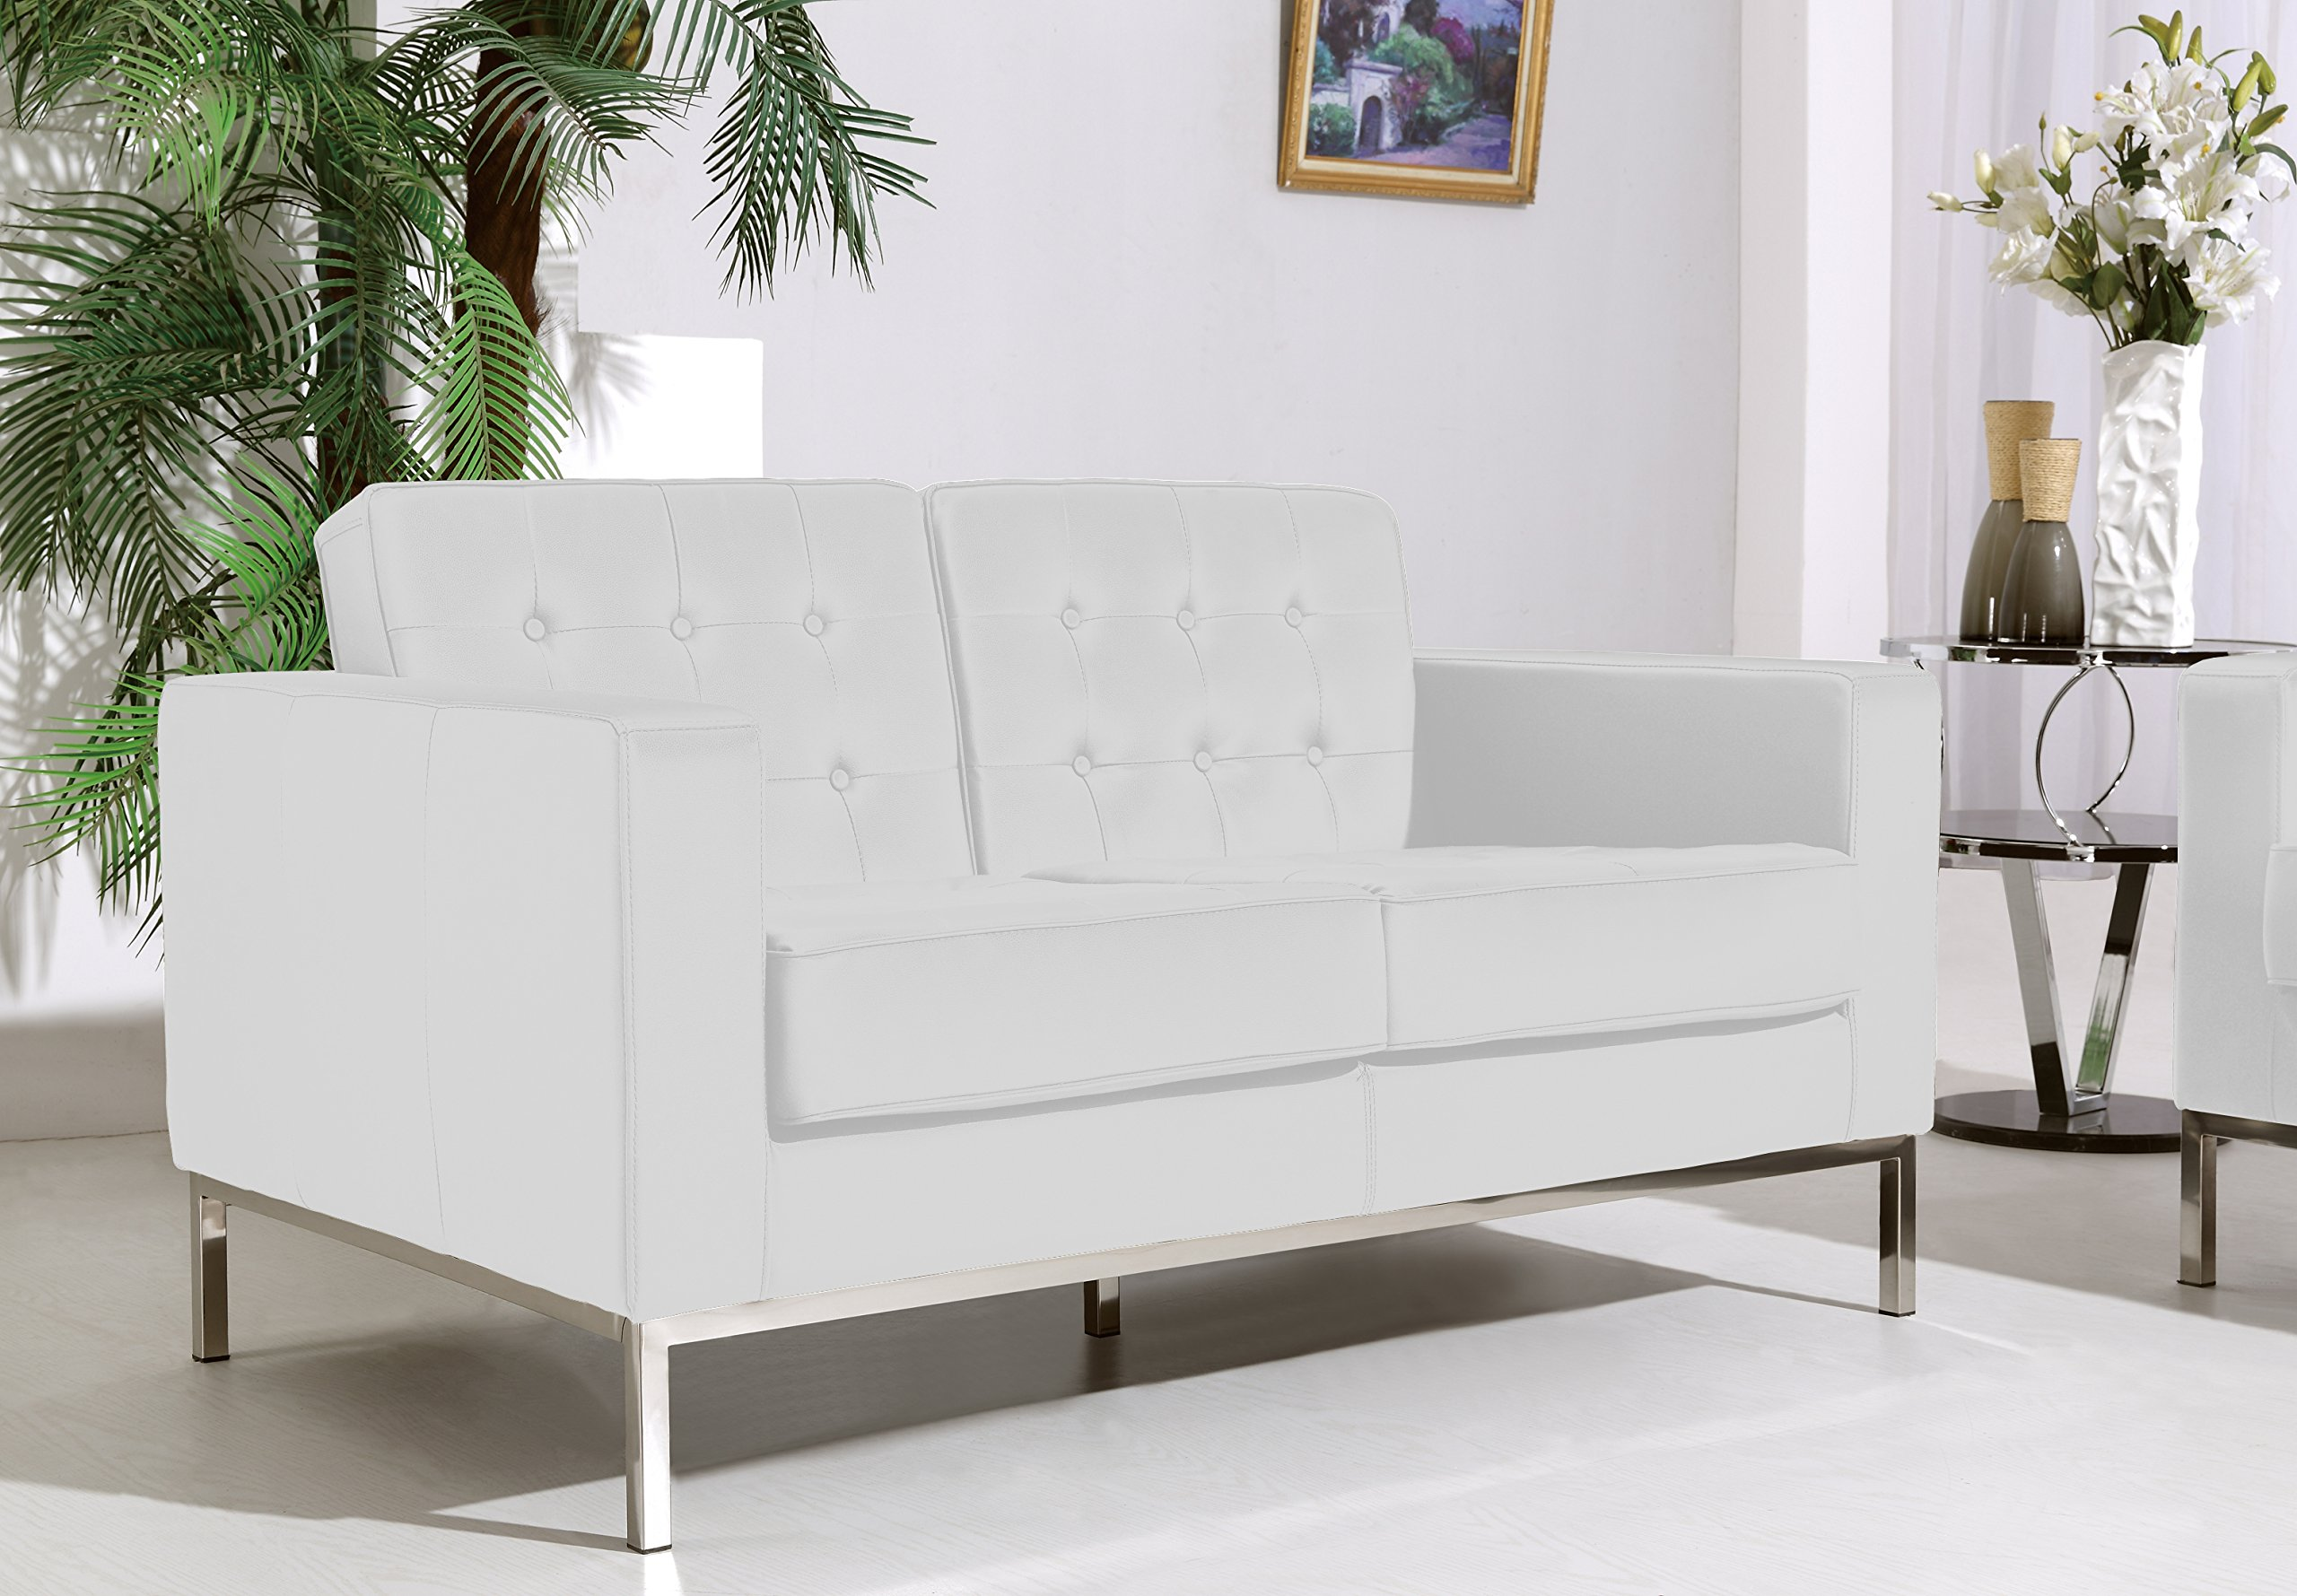 At Home Ahu-055-Wht-11 Sylvania White Loveseat